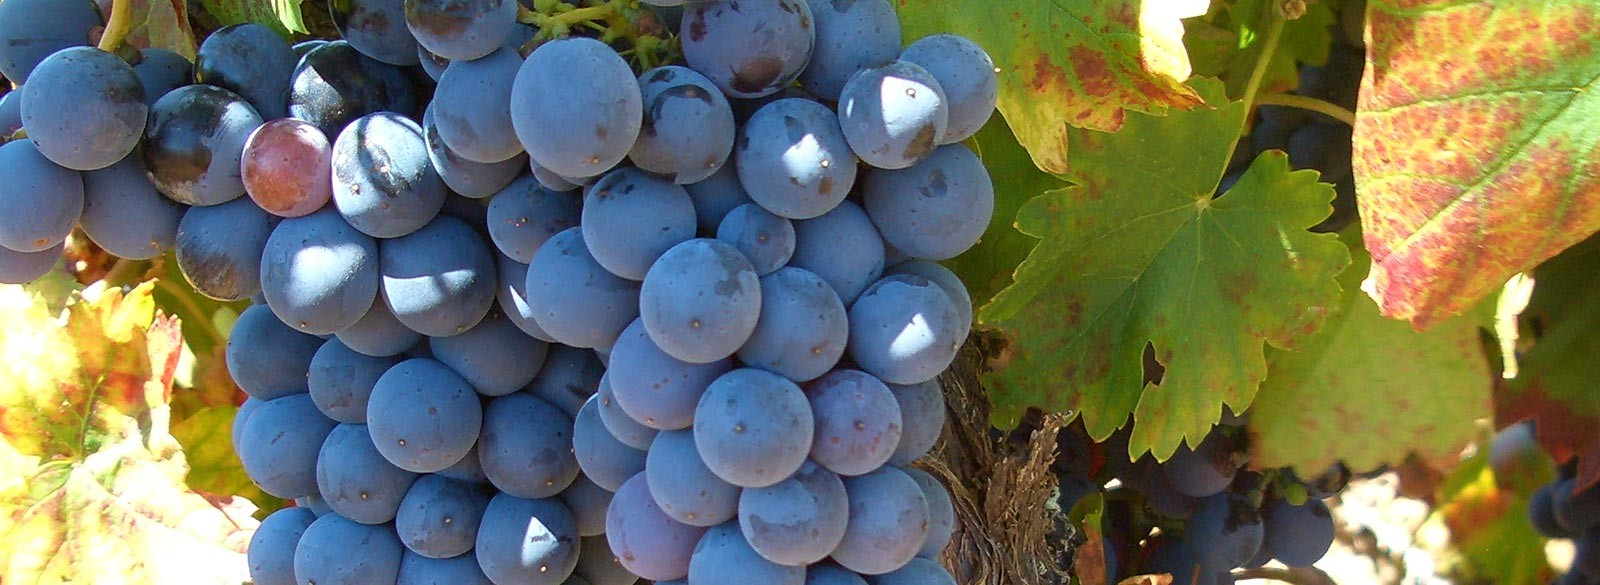 Mencía, la uva tinta del Bierzo